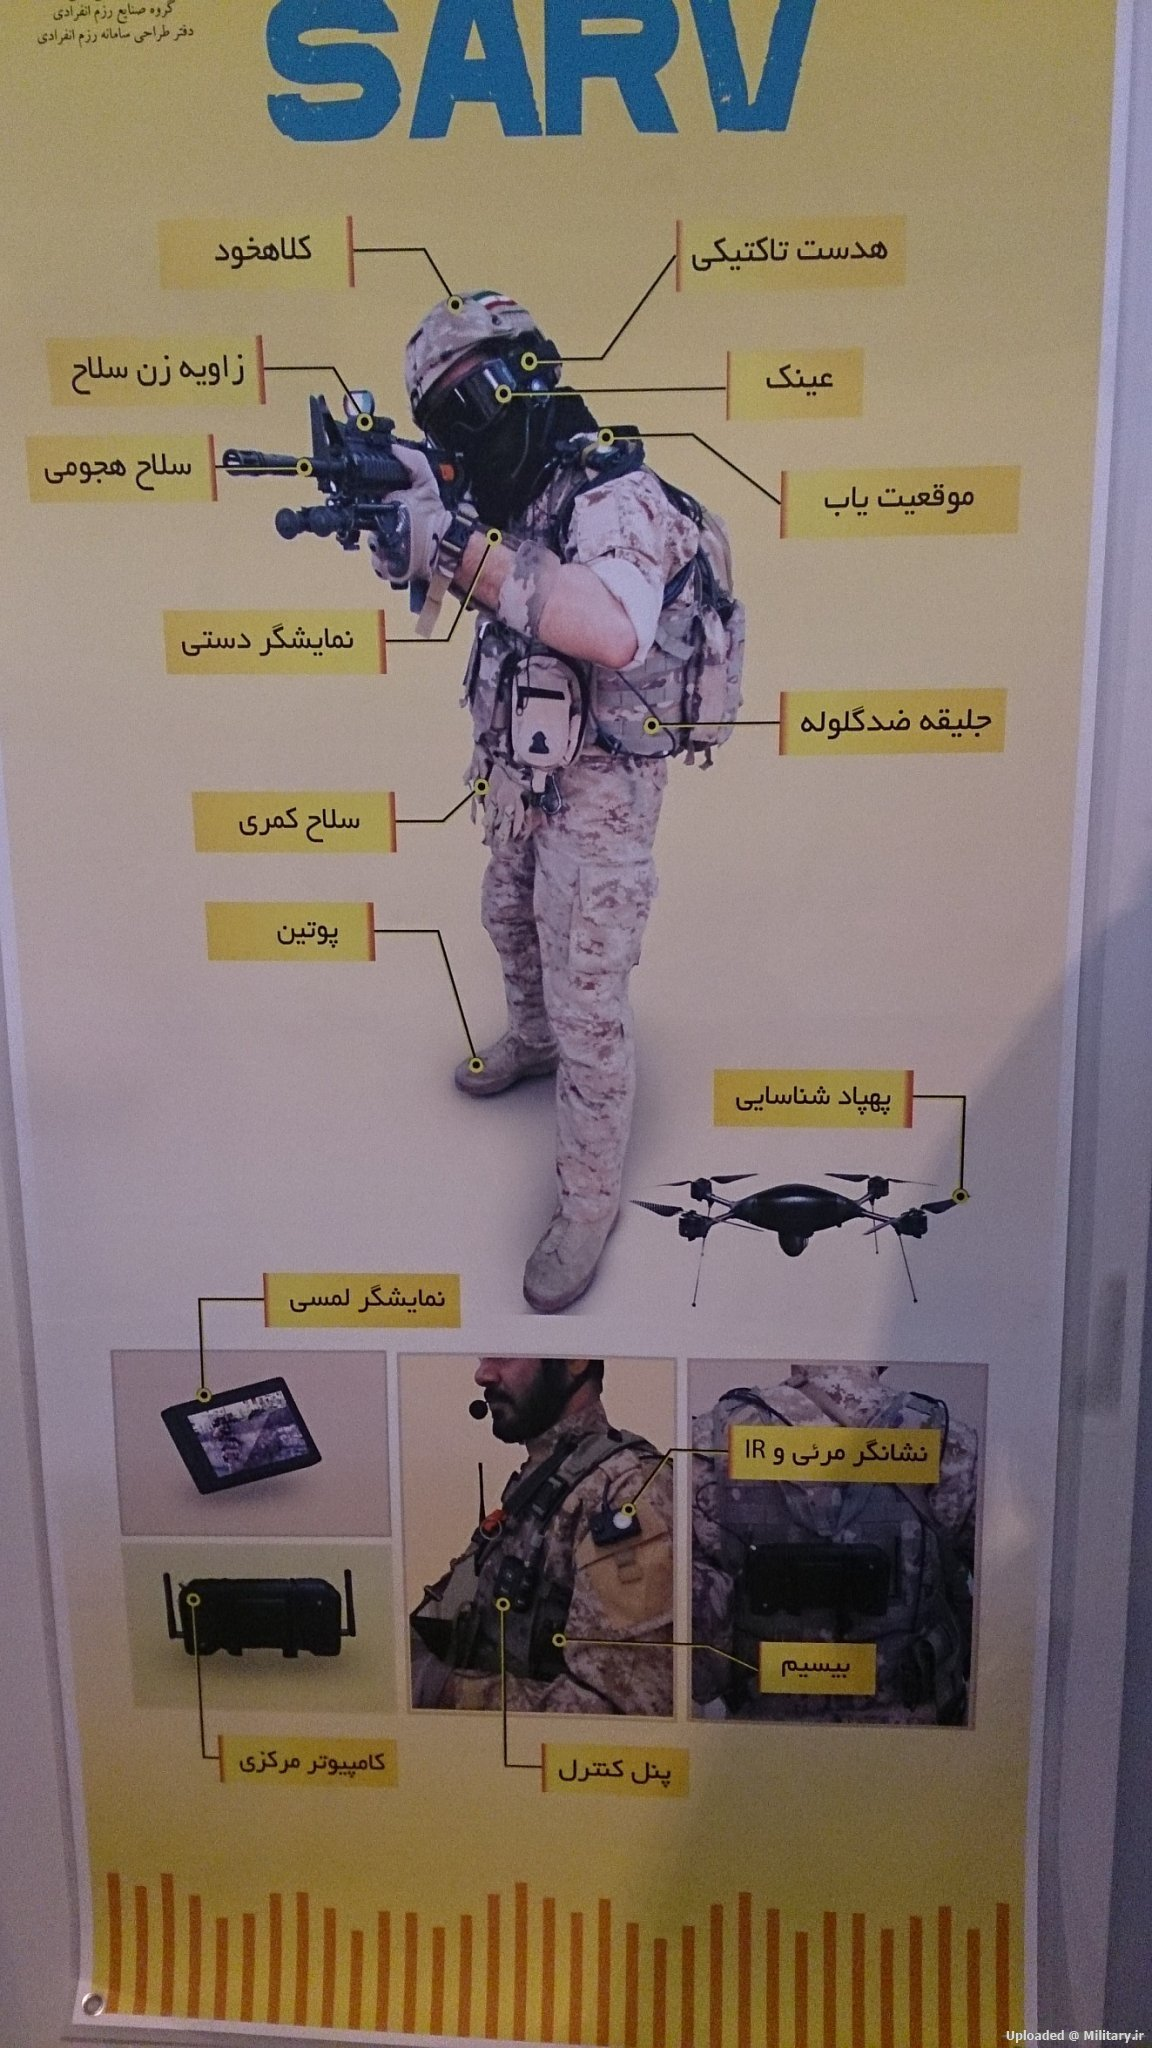 http://gallery.military.ir/albums/userpics/10104/DSC_1150.JPG